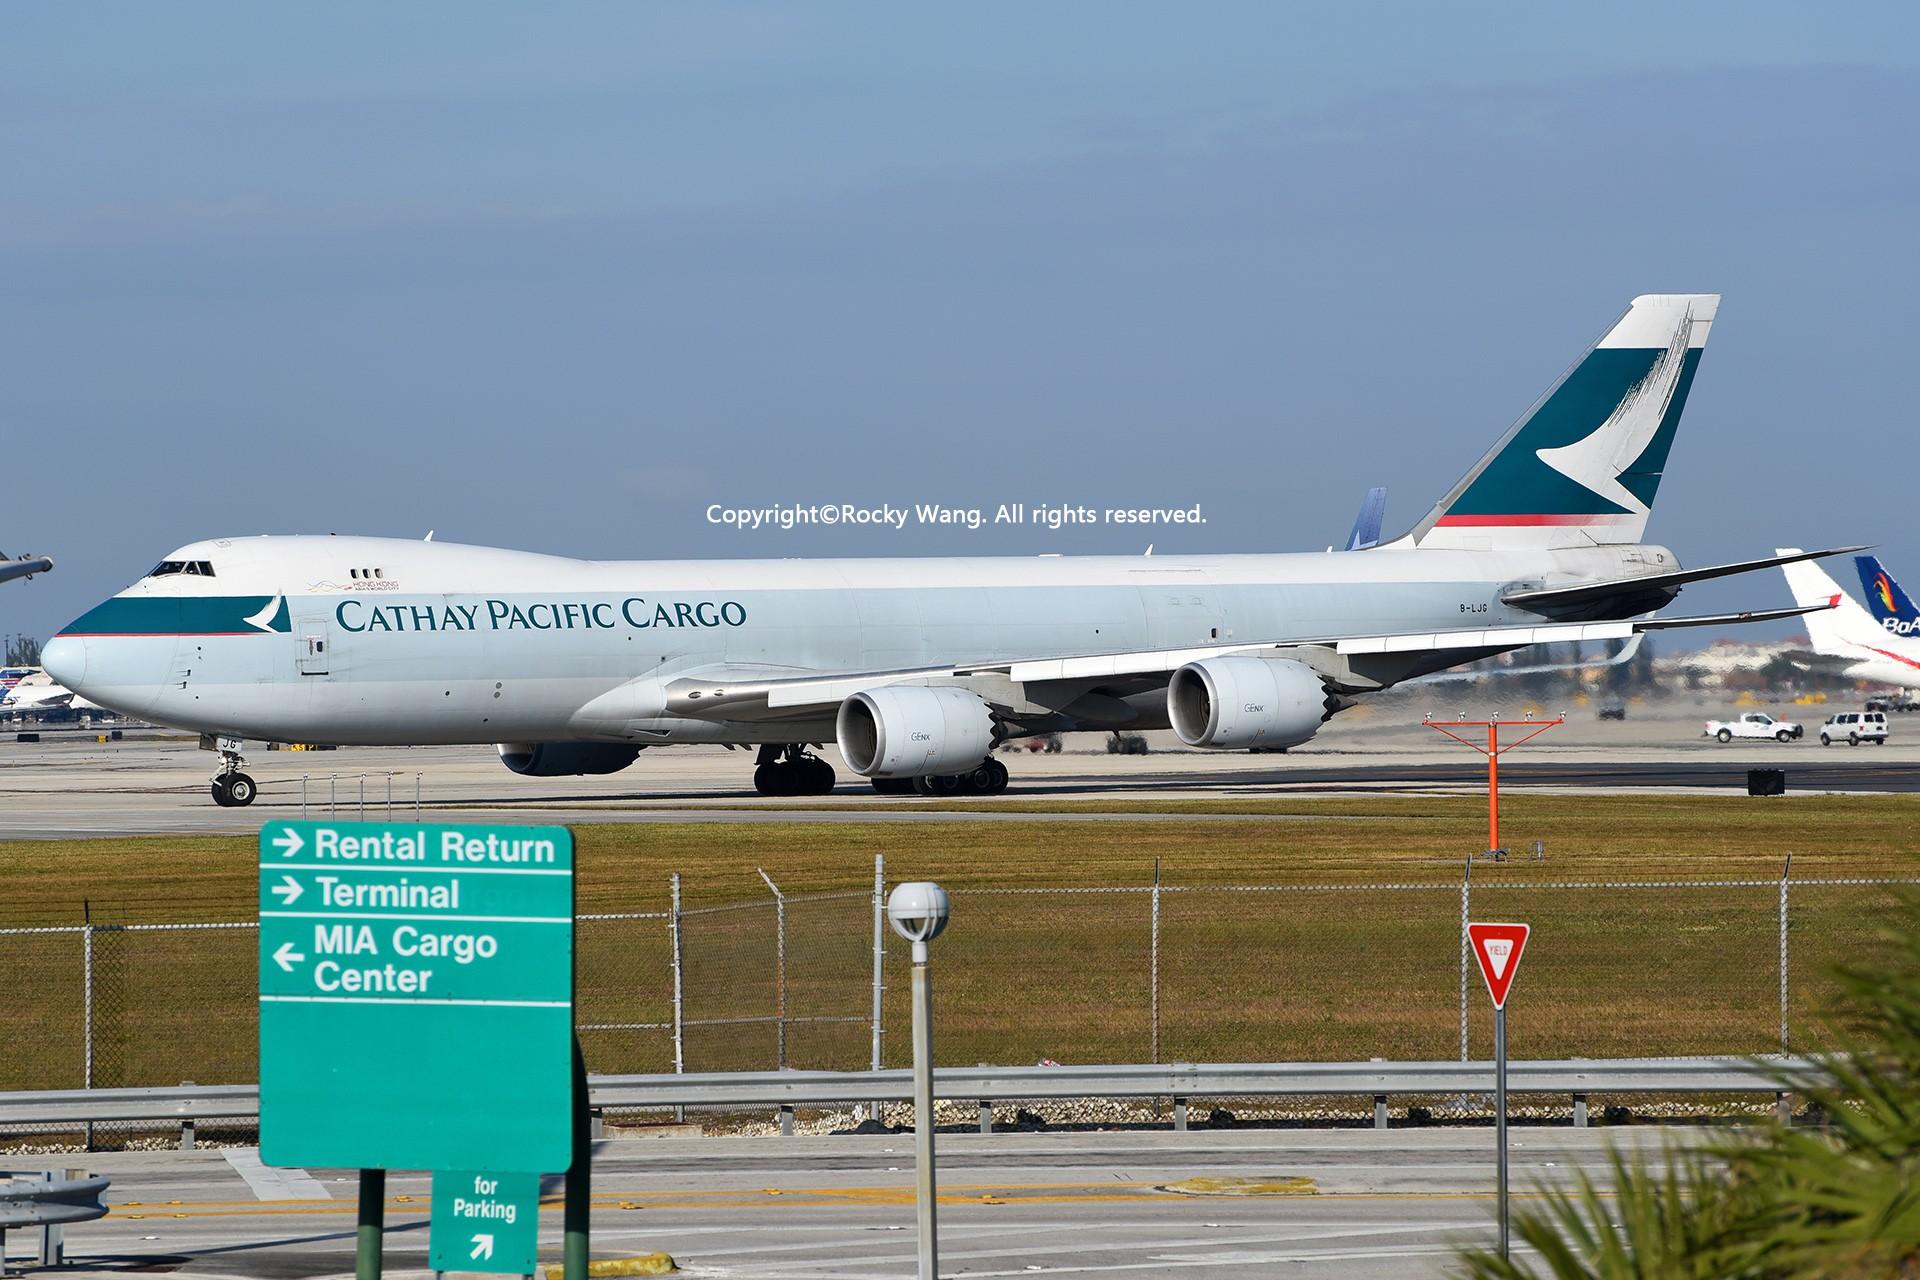 Re:[原创]KMIA 30图 BOEING 747-867F B-LJG Miami Int'l Airport